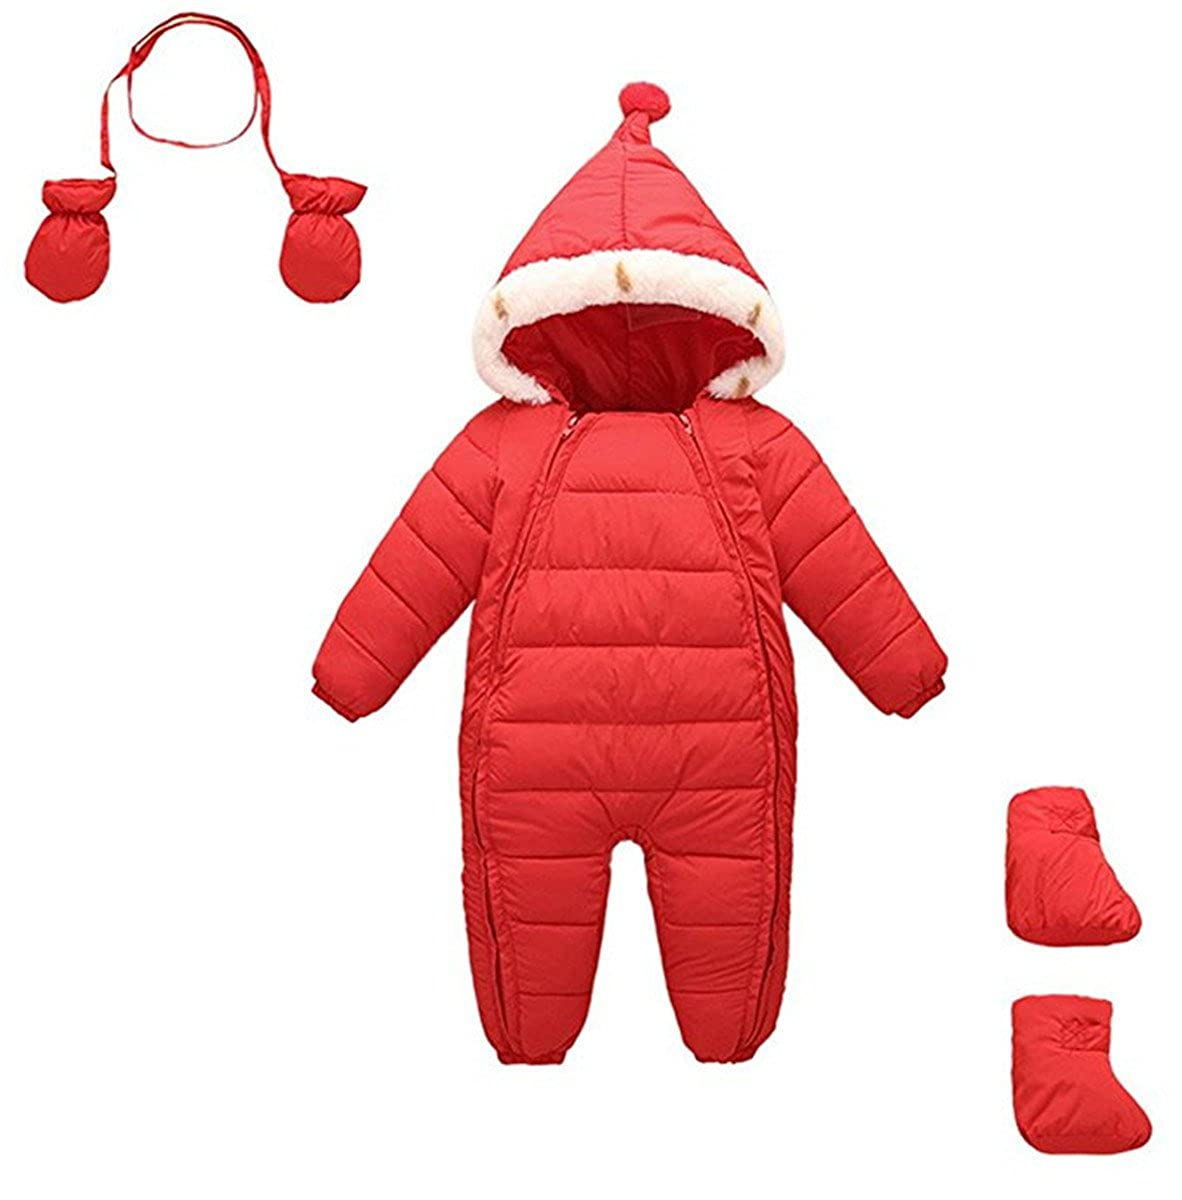 3 Piece Kinder Junge Mädchen Herbst Winter Daunenanzug Daunenmantel Schneeanzug Spielanzug Overall